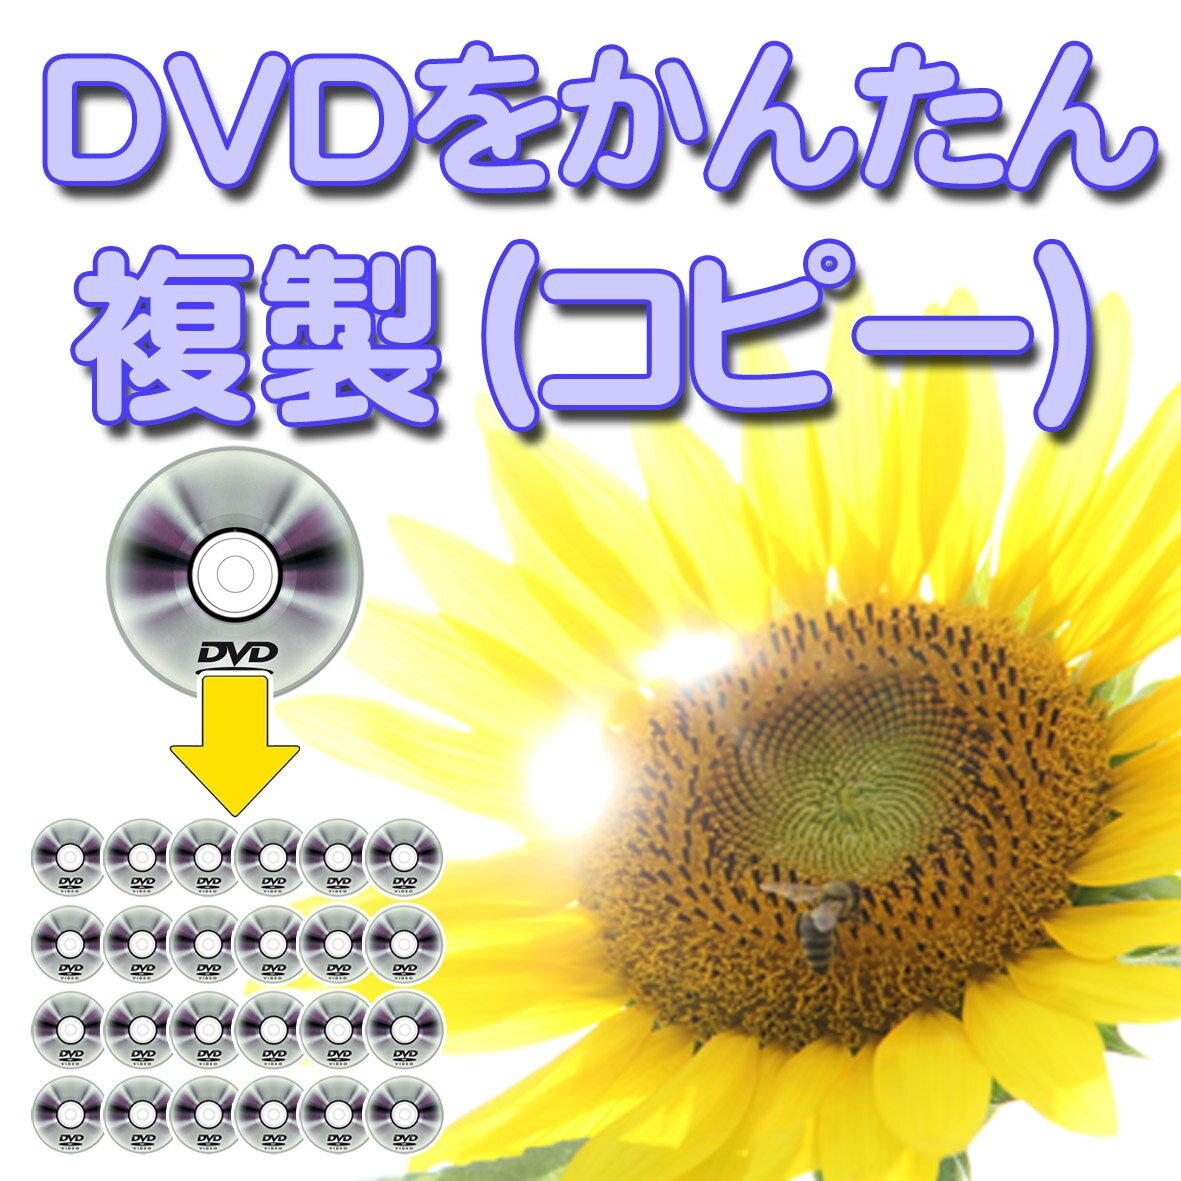 DVDコピー ☆マスタDVDから複製します(メディア・ケース代込)【dvdダビング・ビデオダビング】